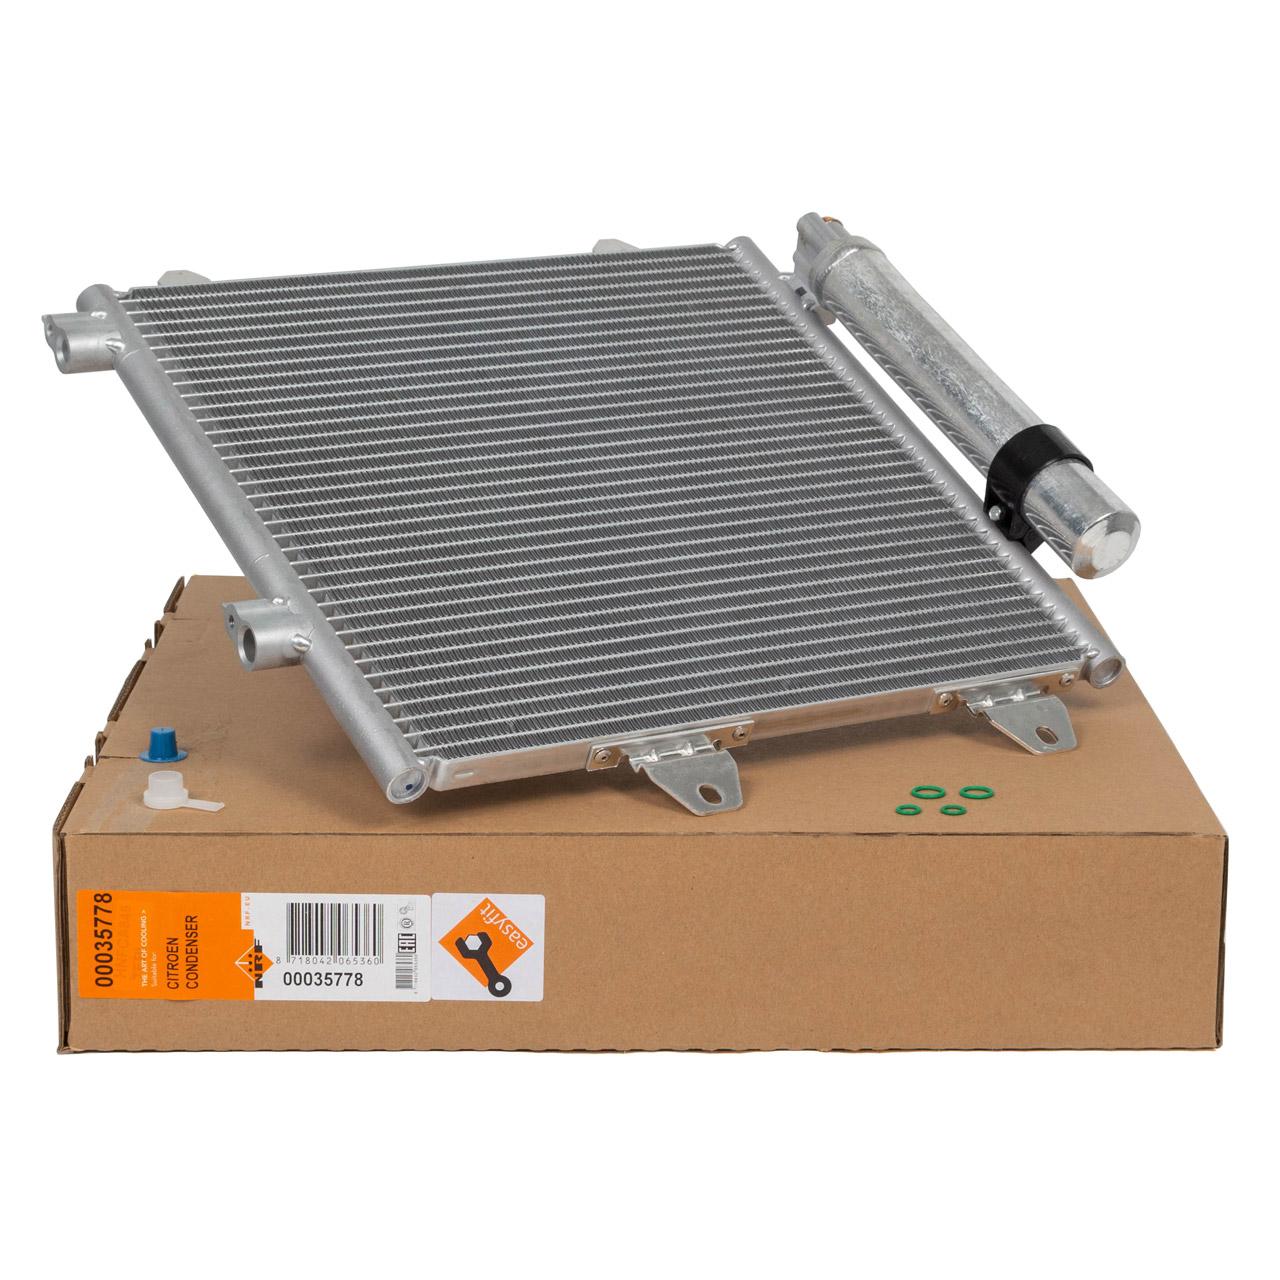 NRF 35778 EASY FIT Kondensator TOYOTA Aygo B1 PEUGEOT 107 PM CITROEN C1 PM 1.0 1.4 HDI